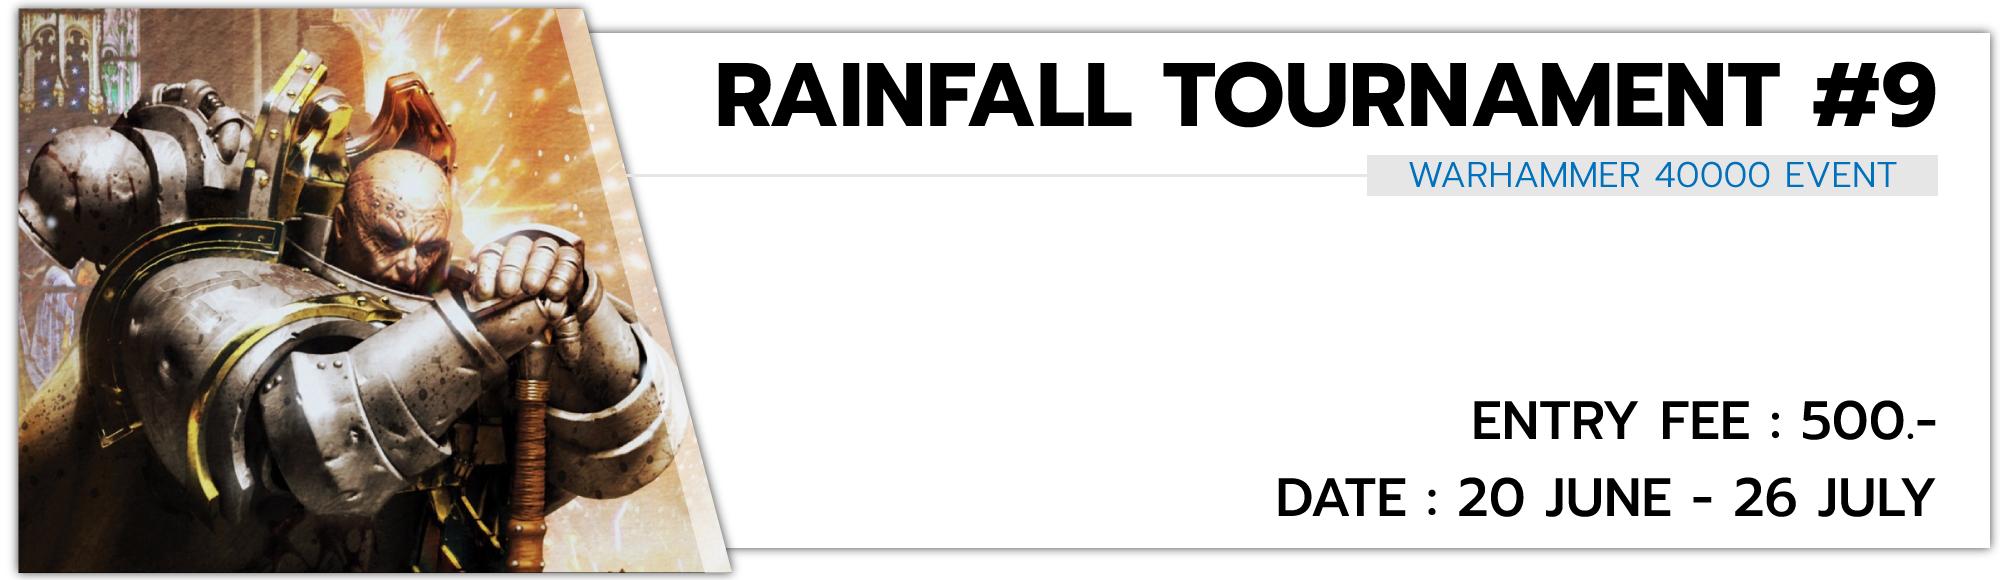 Warhammer 40,000: Rainfall Tournamet#9